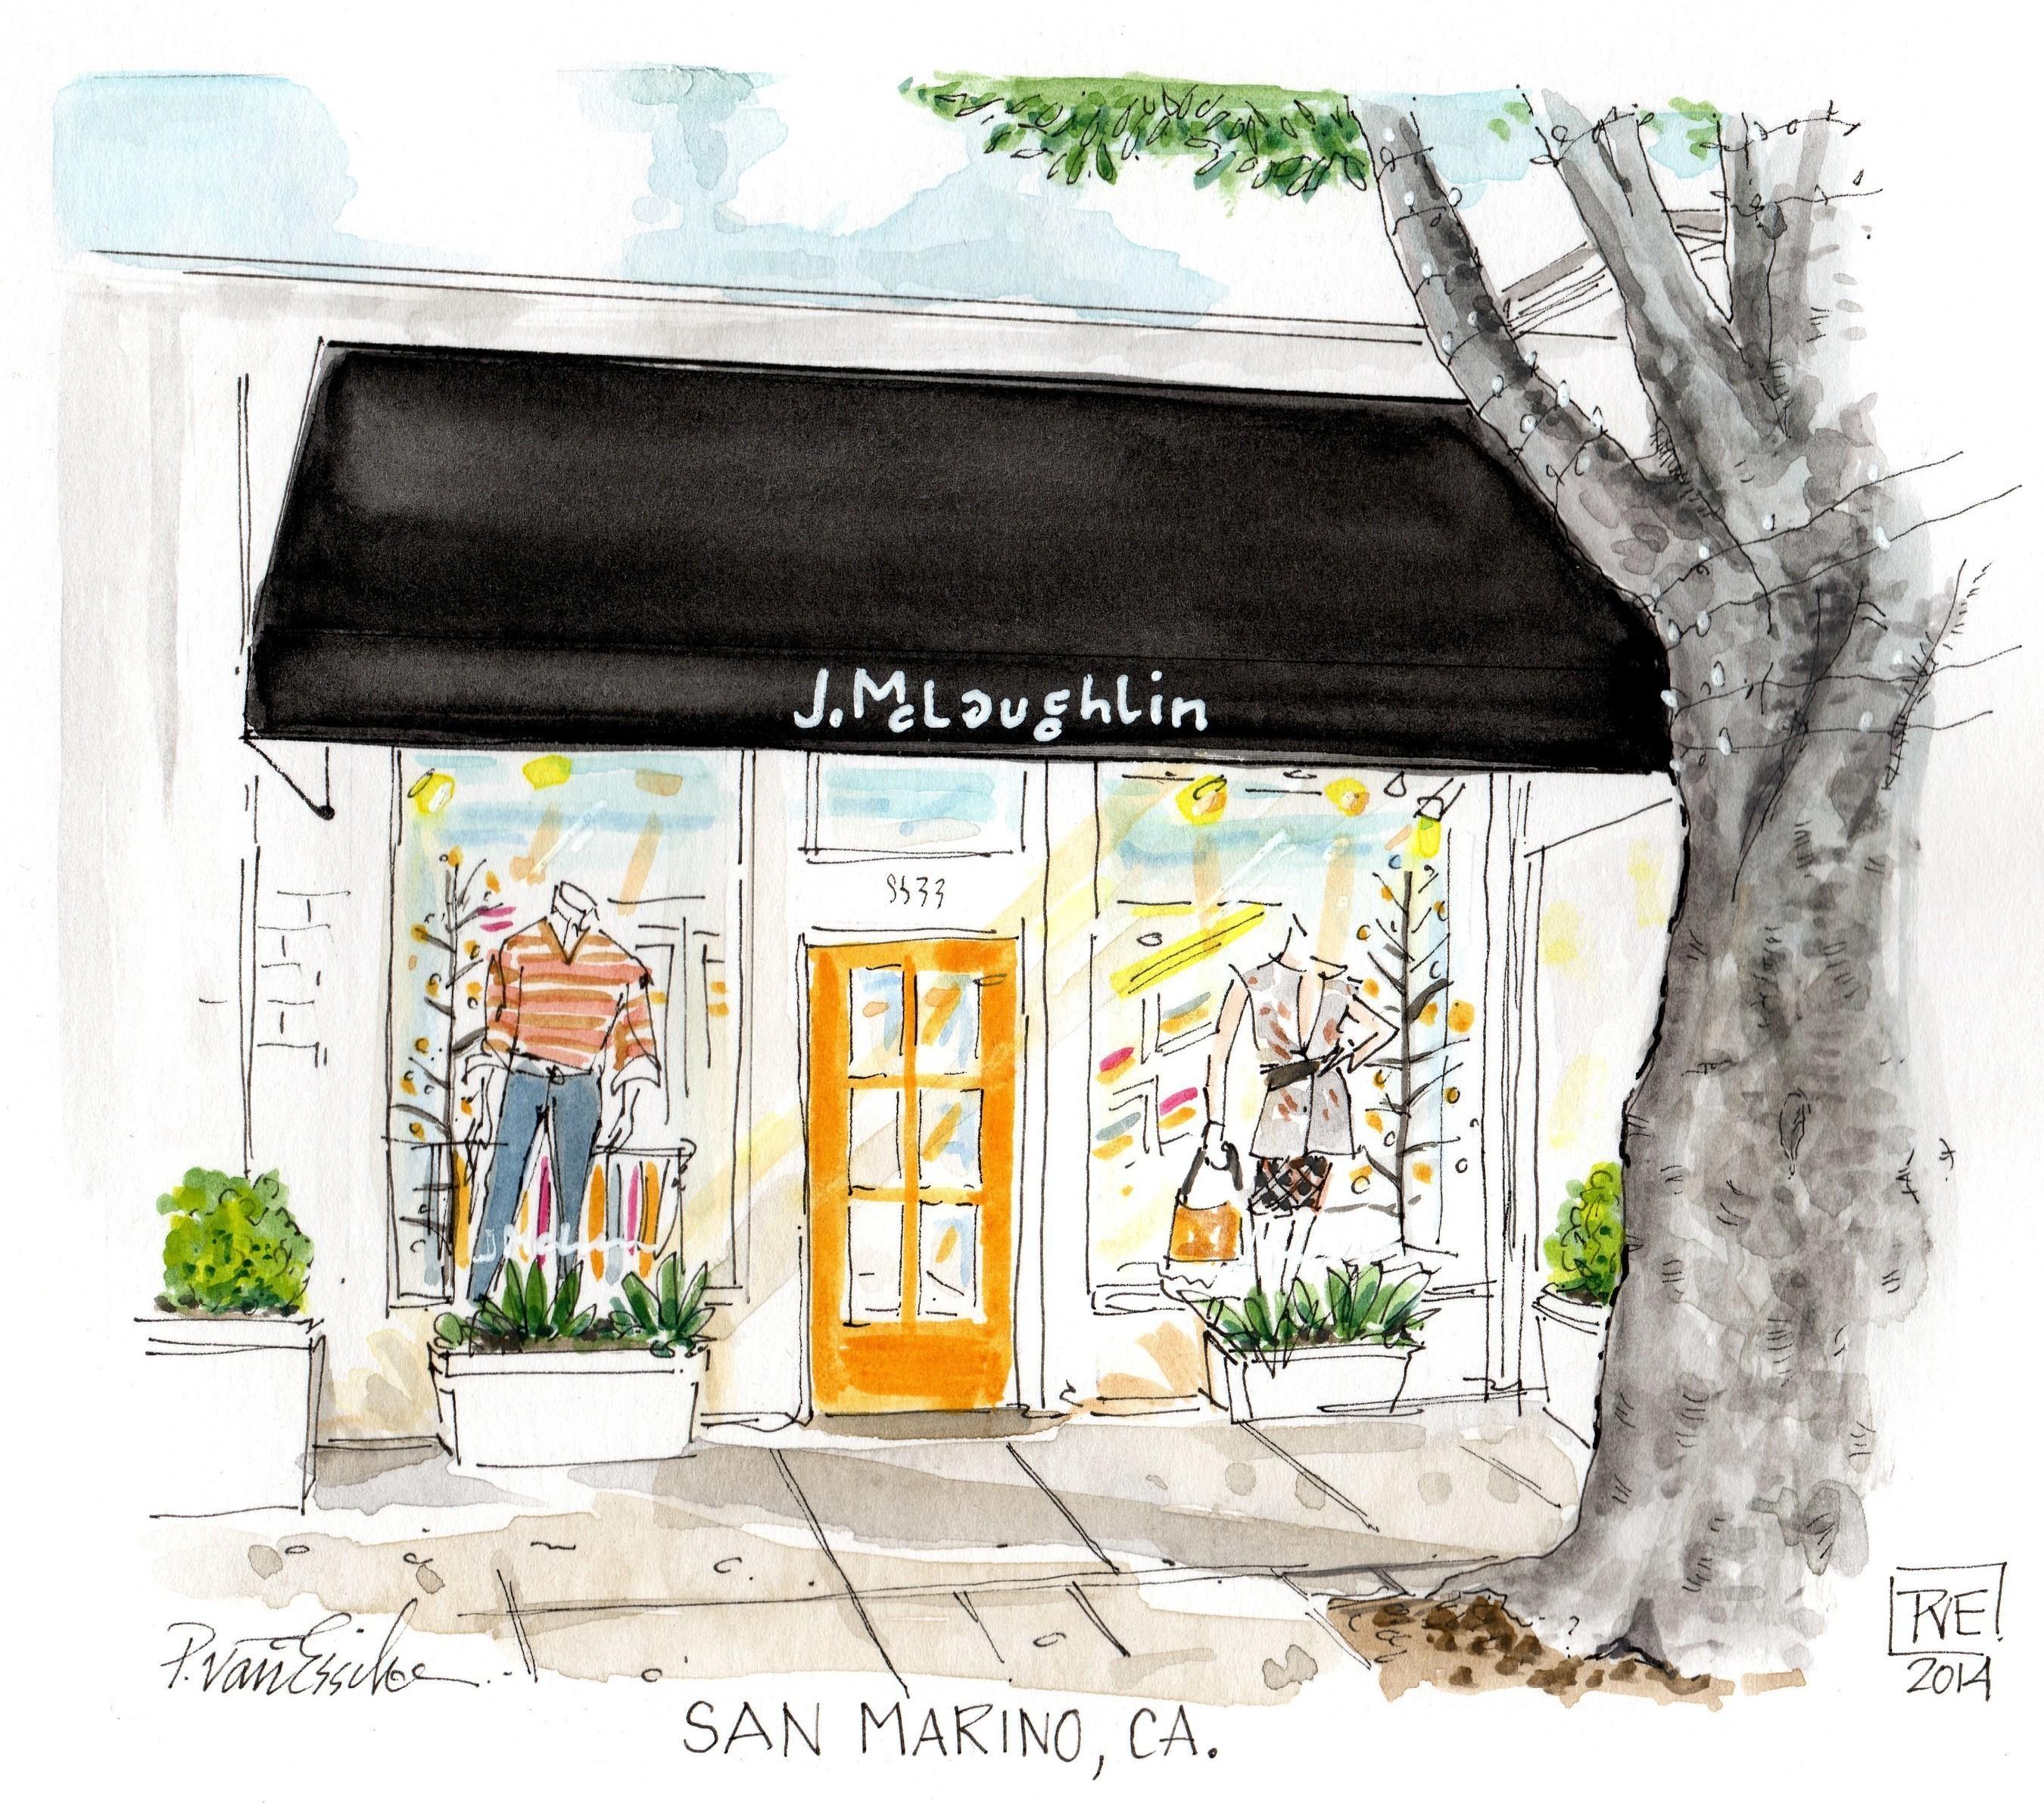 J.McLaughlin San Marino, CA Boutique.